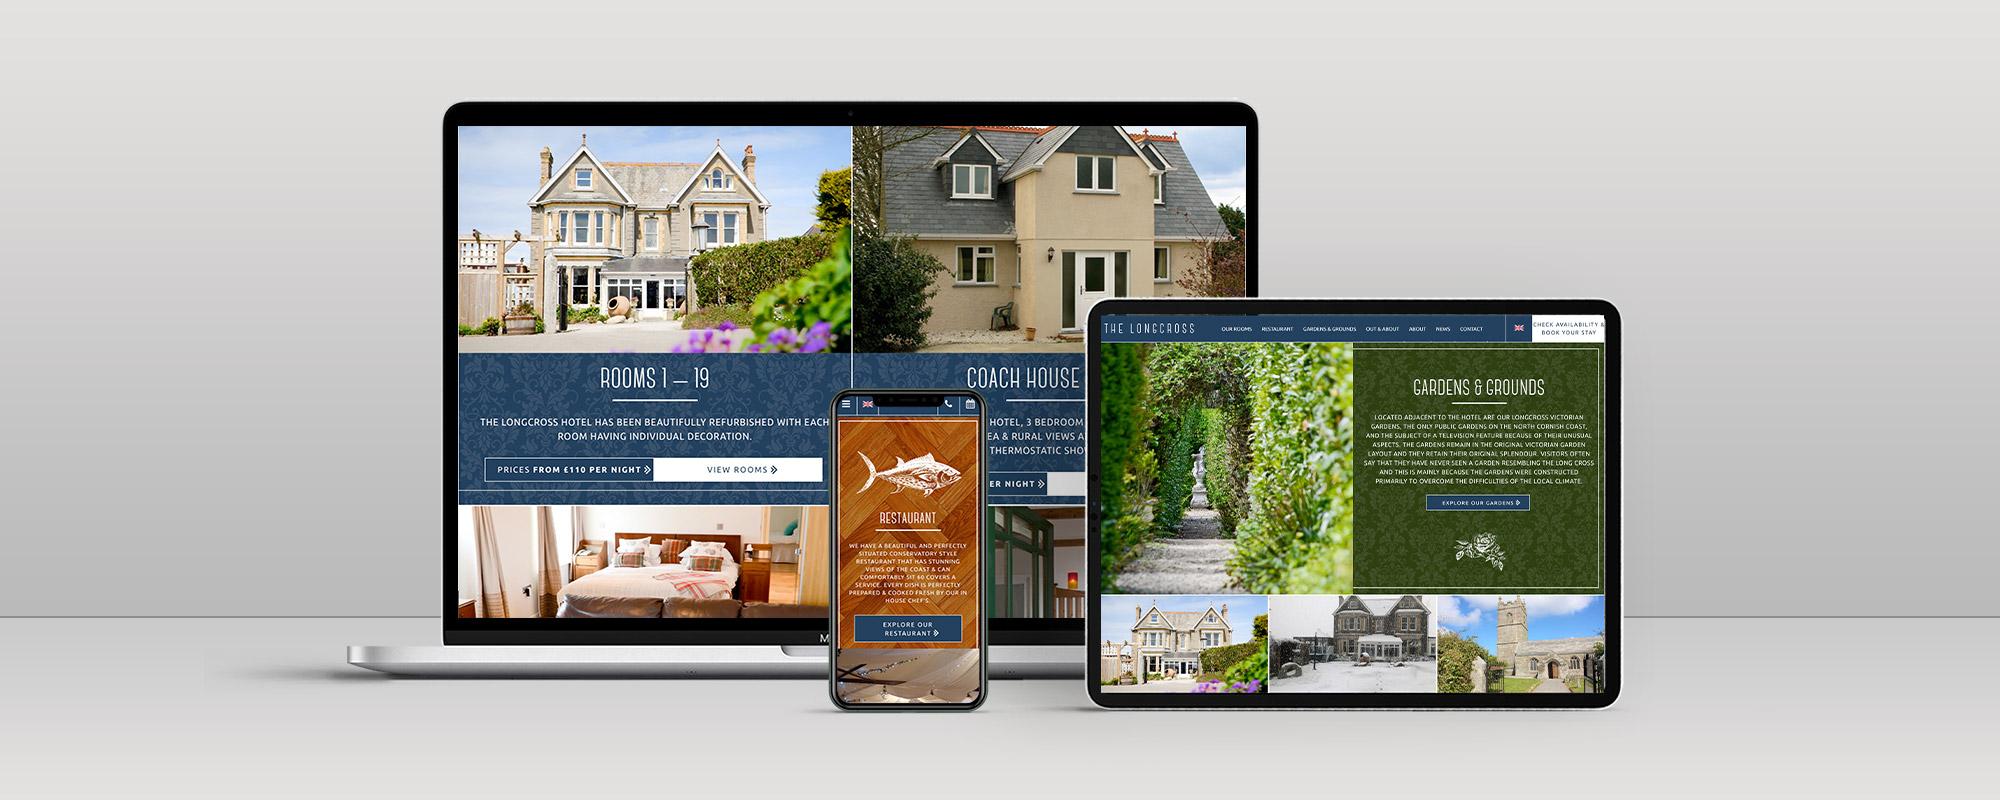 Longcross Hotel Wordpress Website Design on 3 Devices